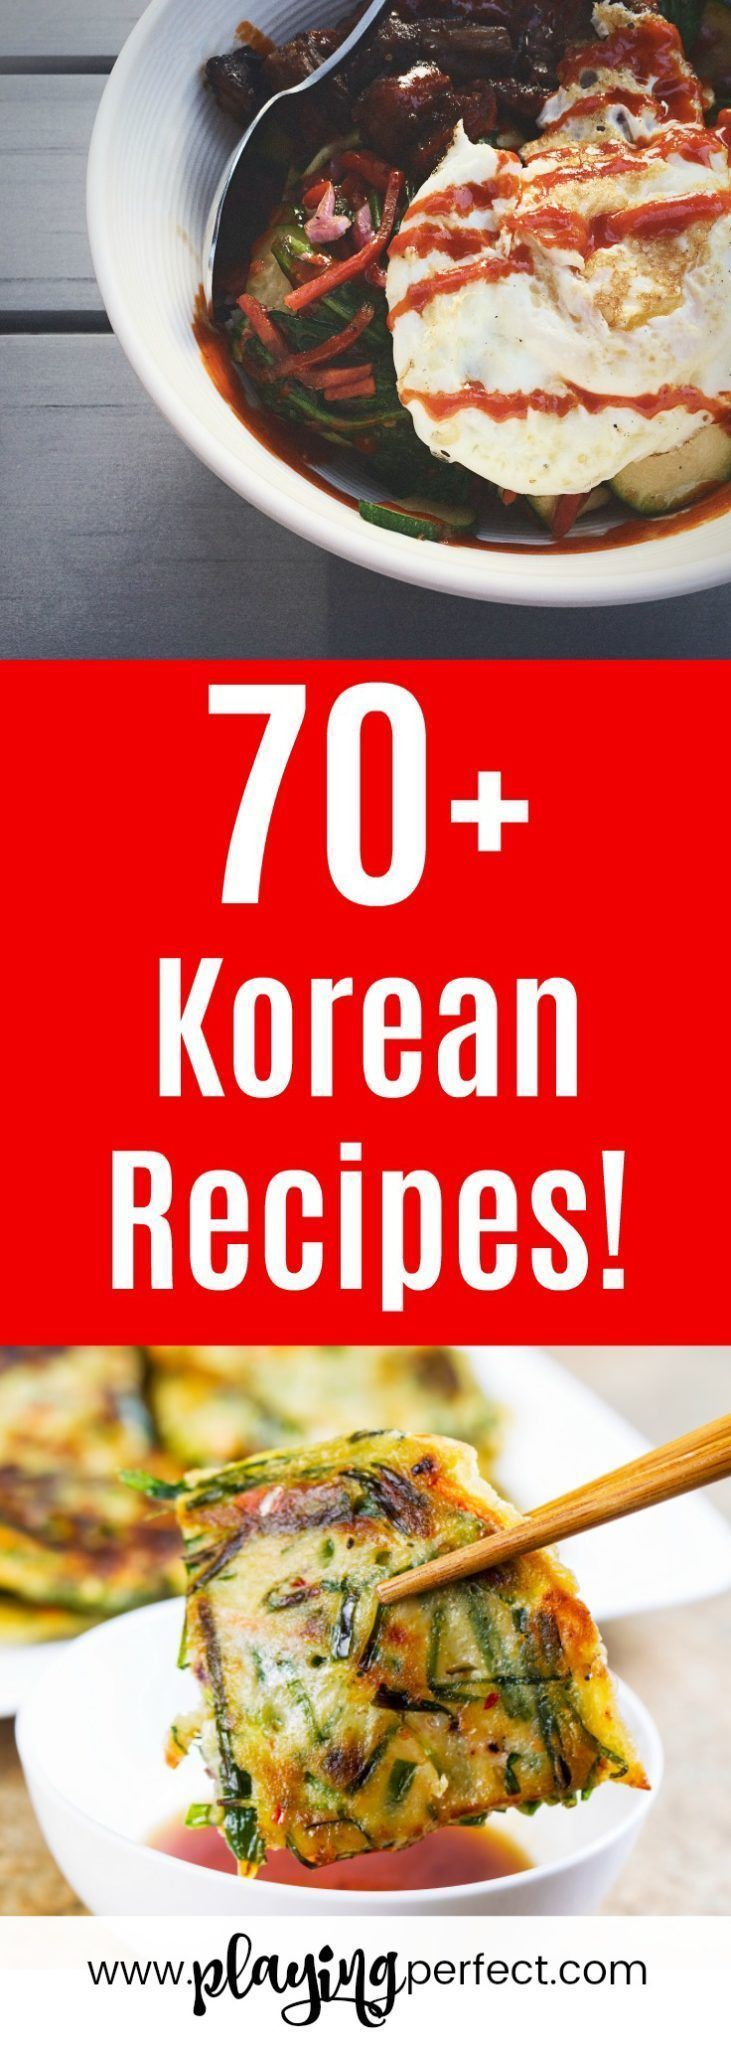 Mejores 10778 imgenes de korean food recipes en pinterest recetas korean recipes here are 70 authentic korean recipes fusion korean recipes korean side dish recipes korean dessert recipes and all sorts of korean meal forumfinder Image collections